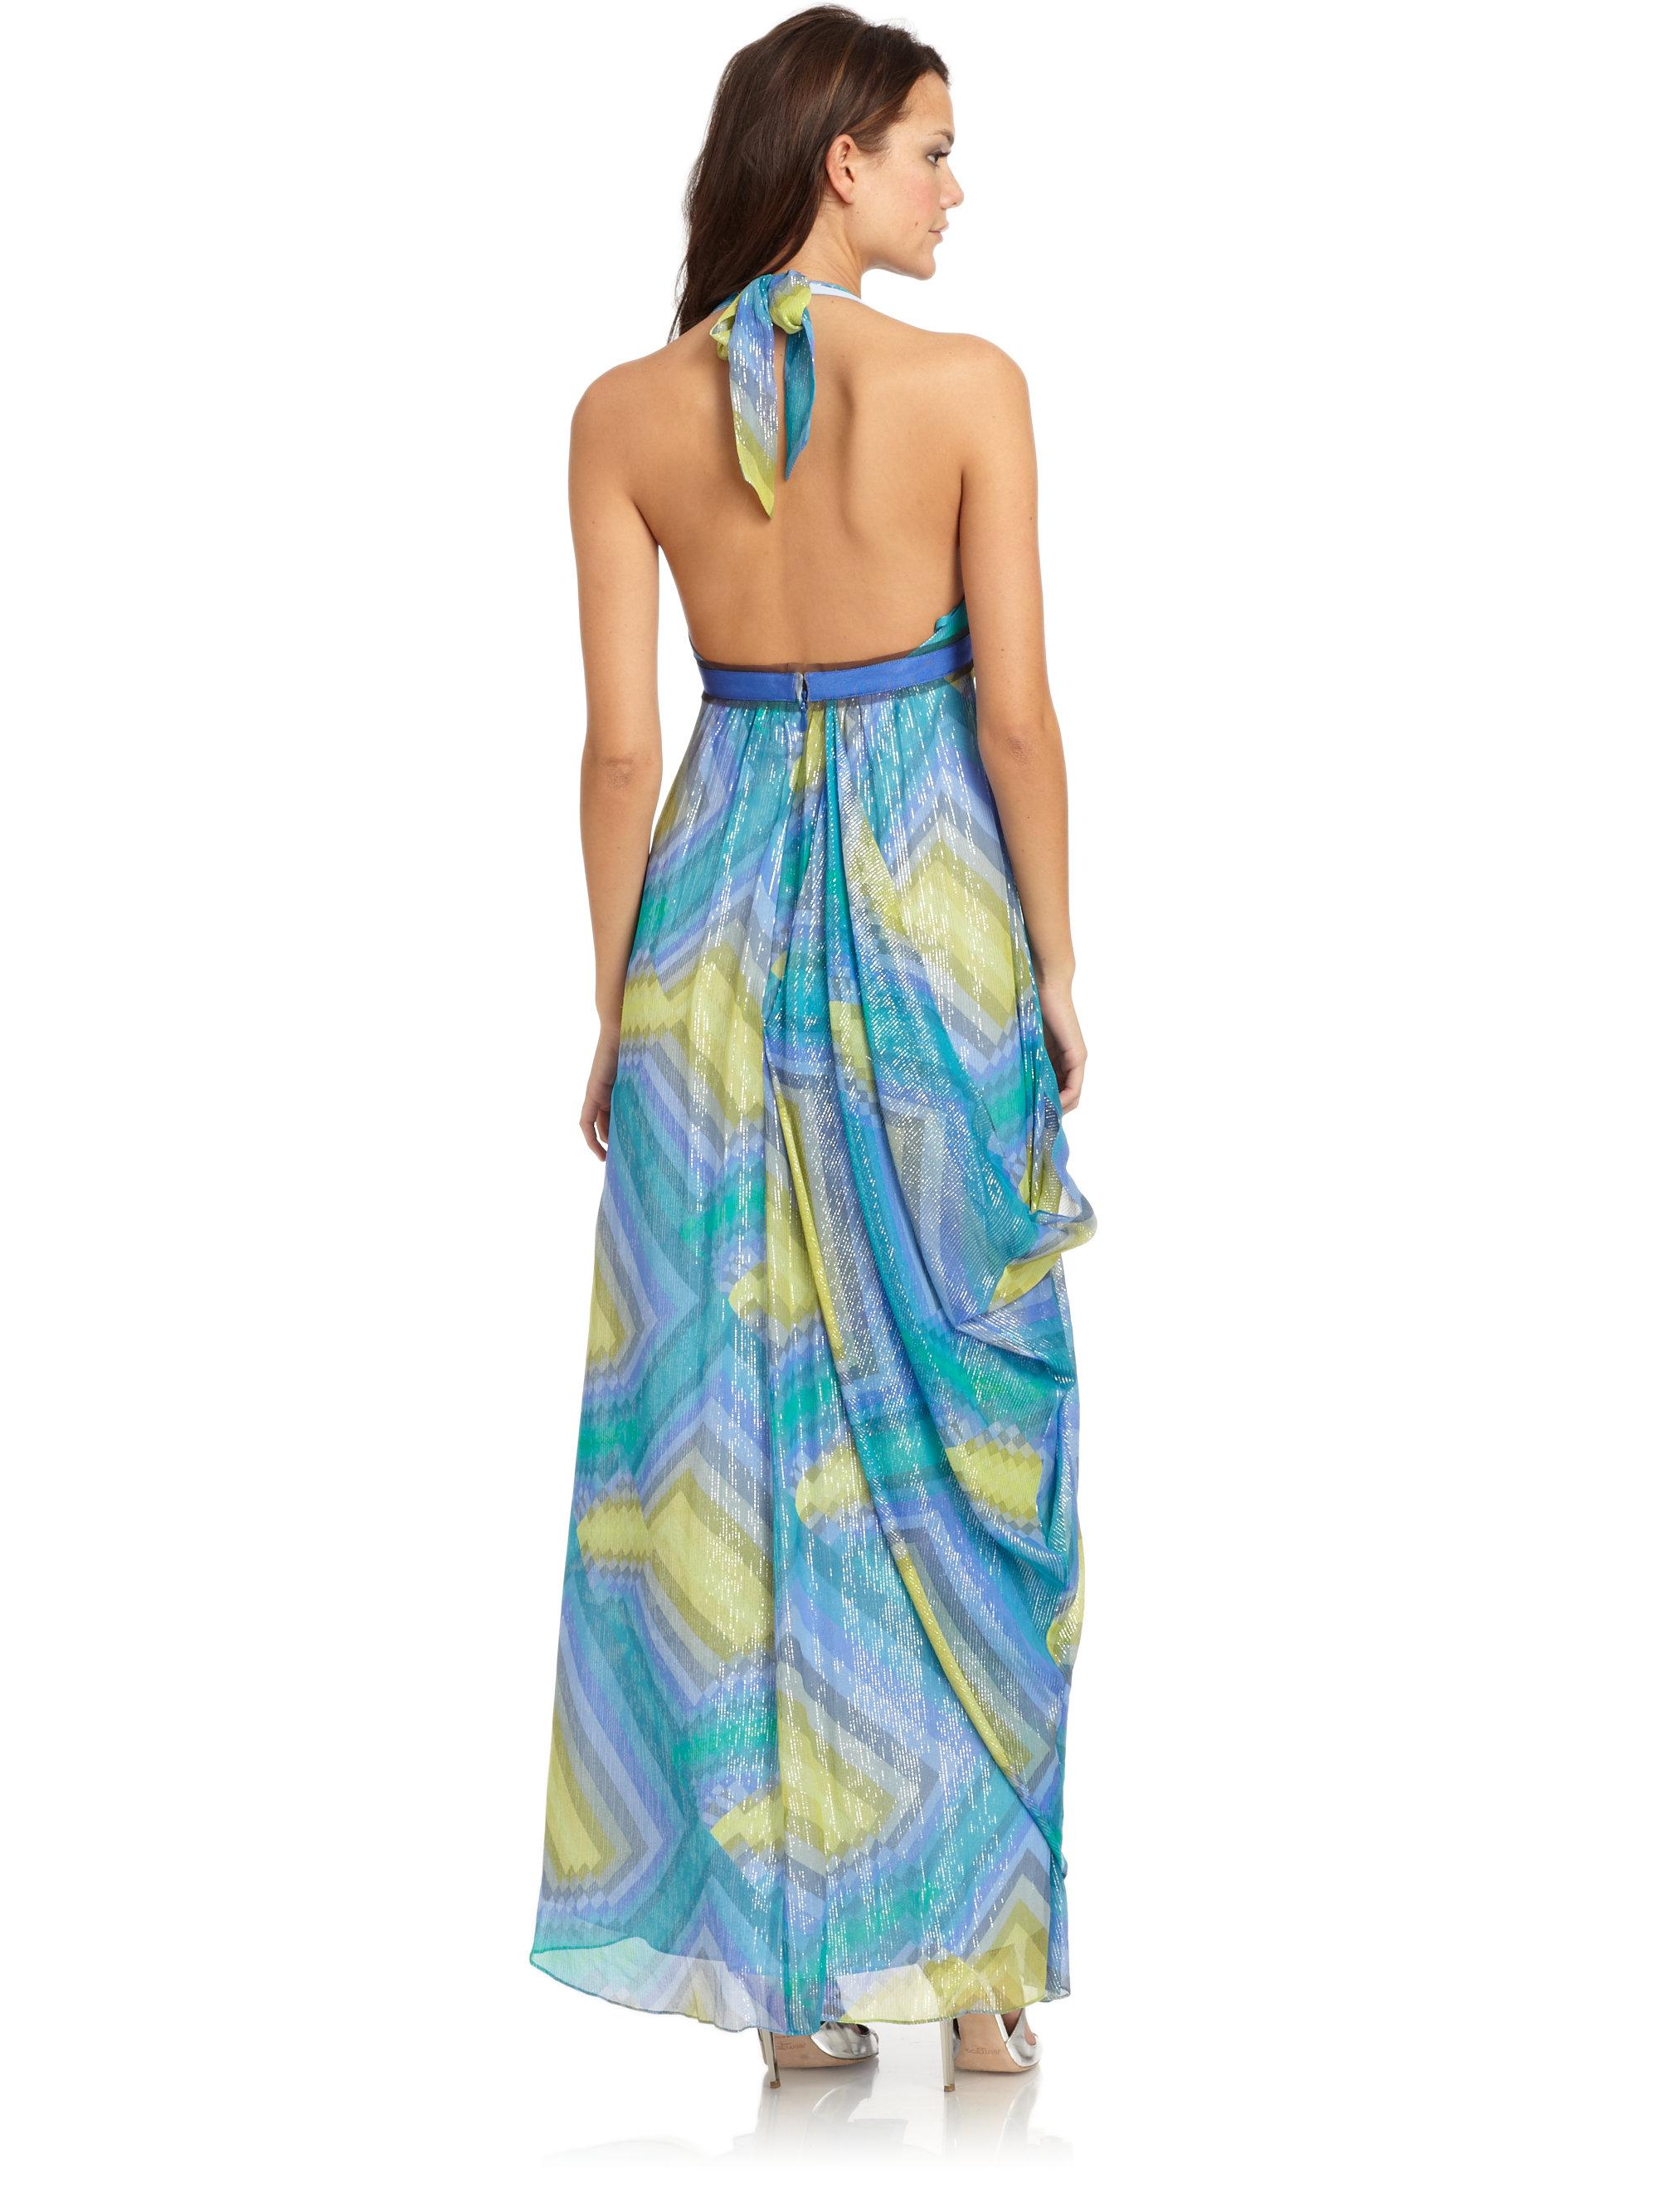 Bcbg tie dye maxi dress